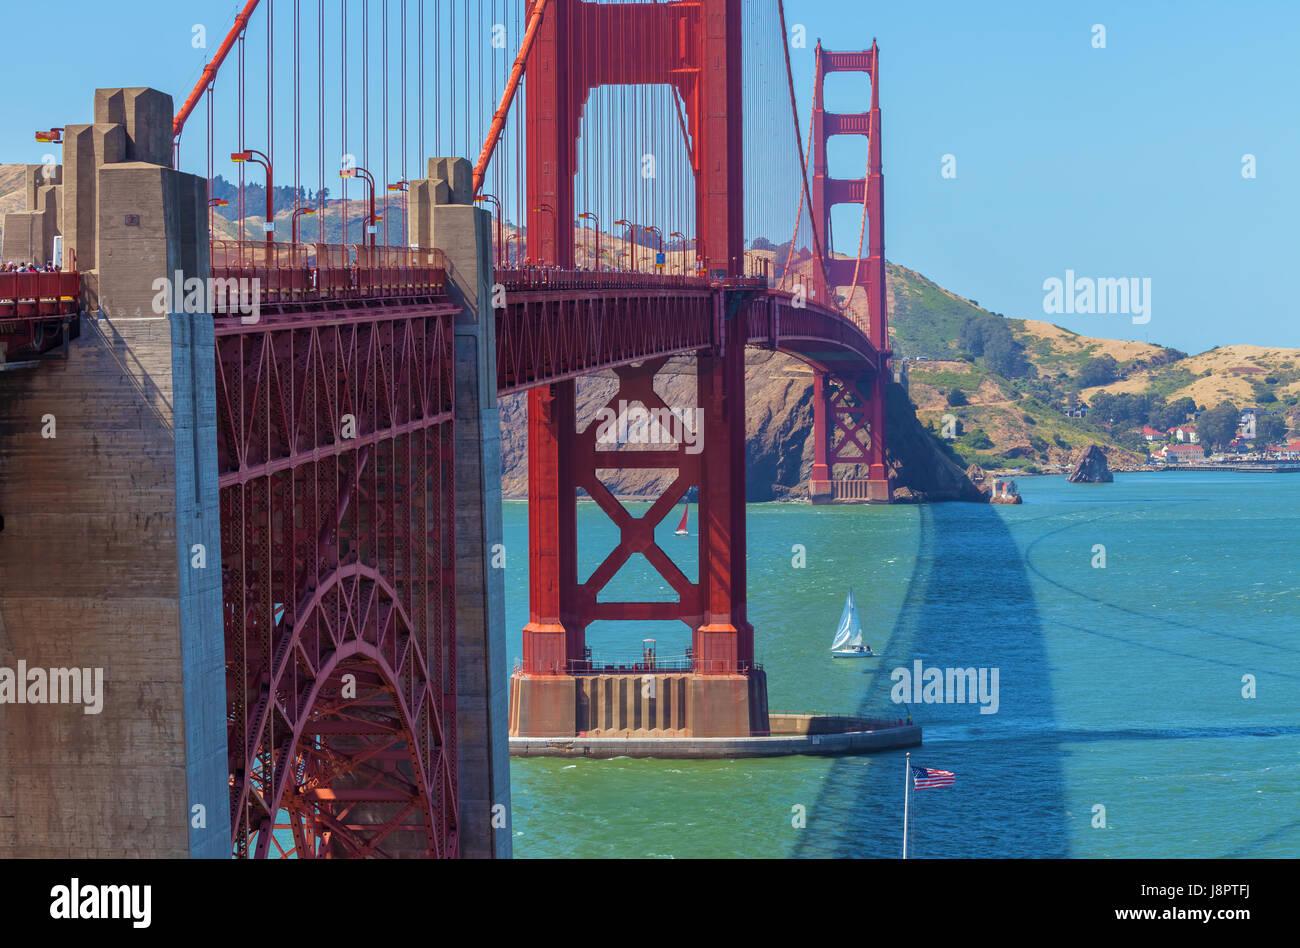 El famoso puente Golden Gate en san francisco, usasu Imagen De Stock